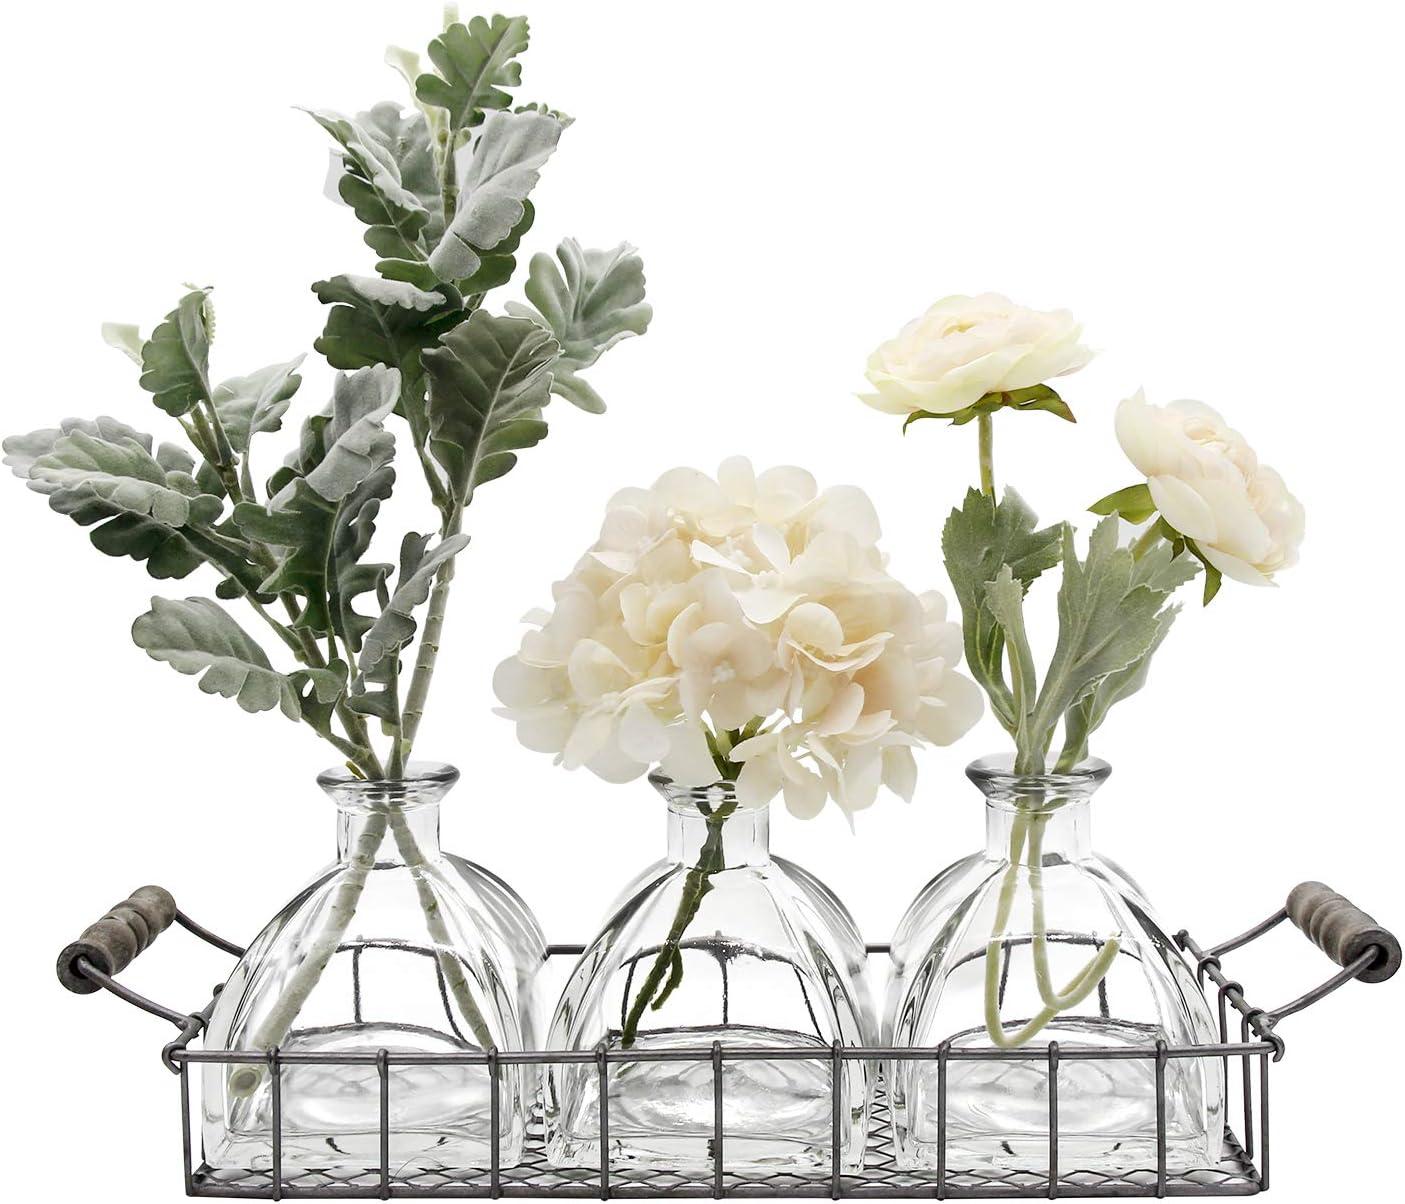 FUNSOBA Rustic Flower Vase Set with Metal Tray Farmhouse Glass Bottles for Decor (3 Vase Type C)